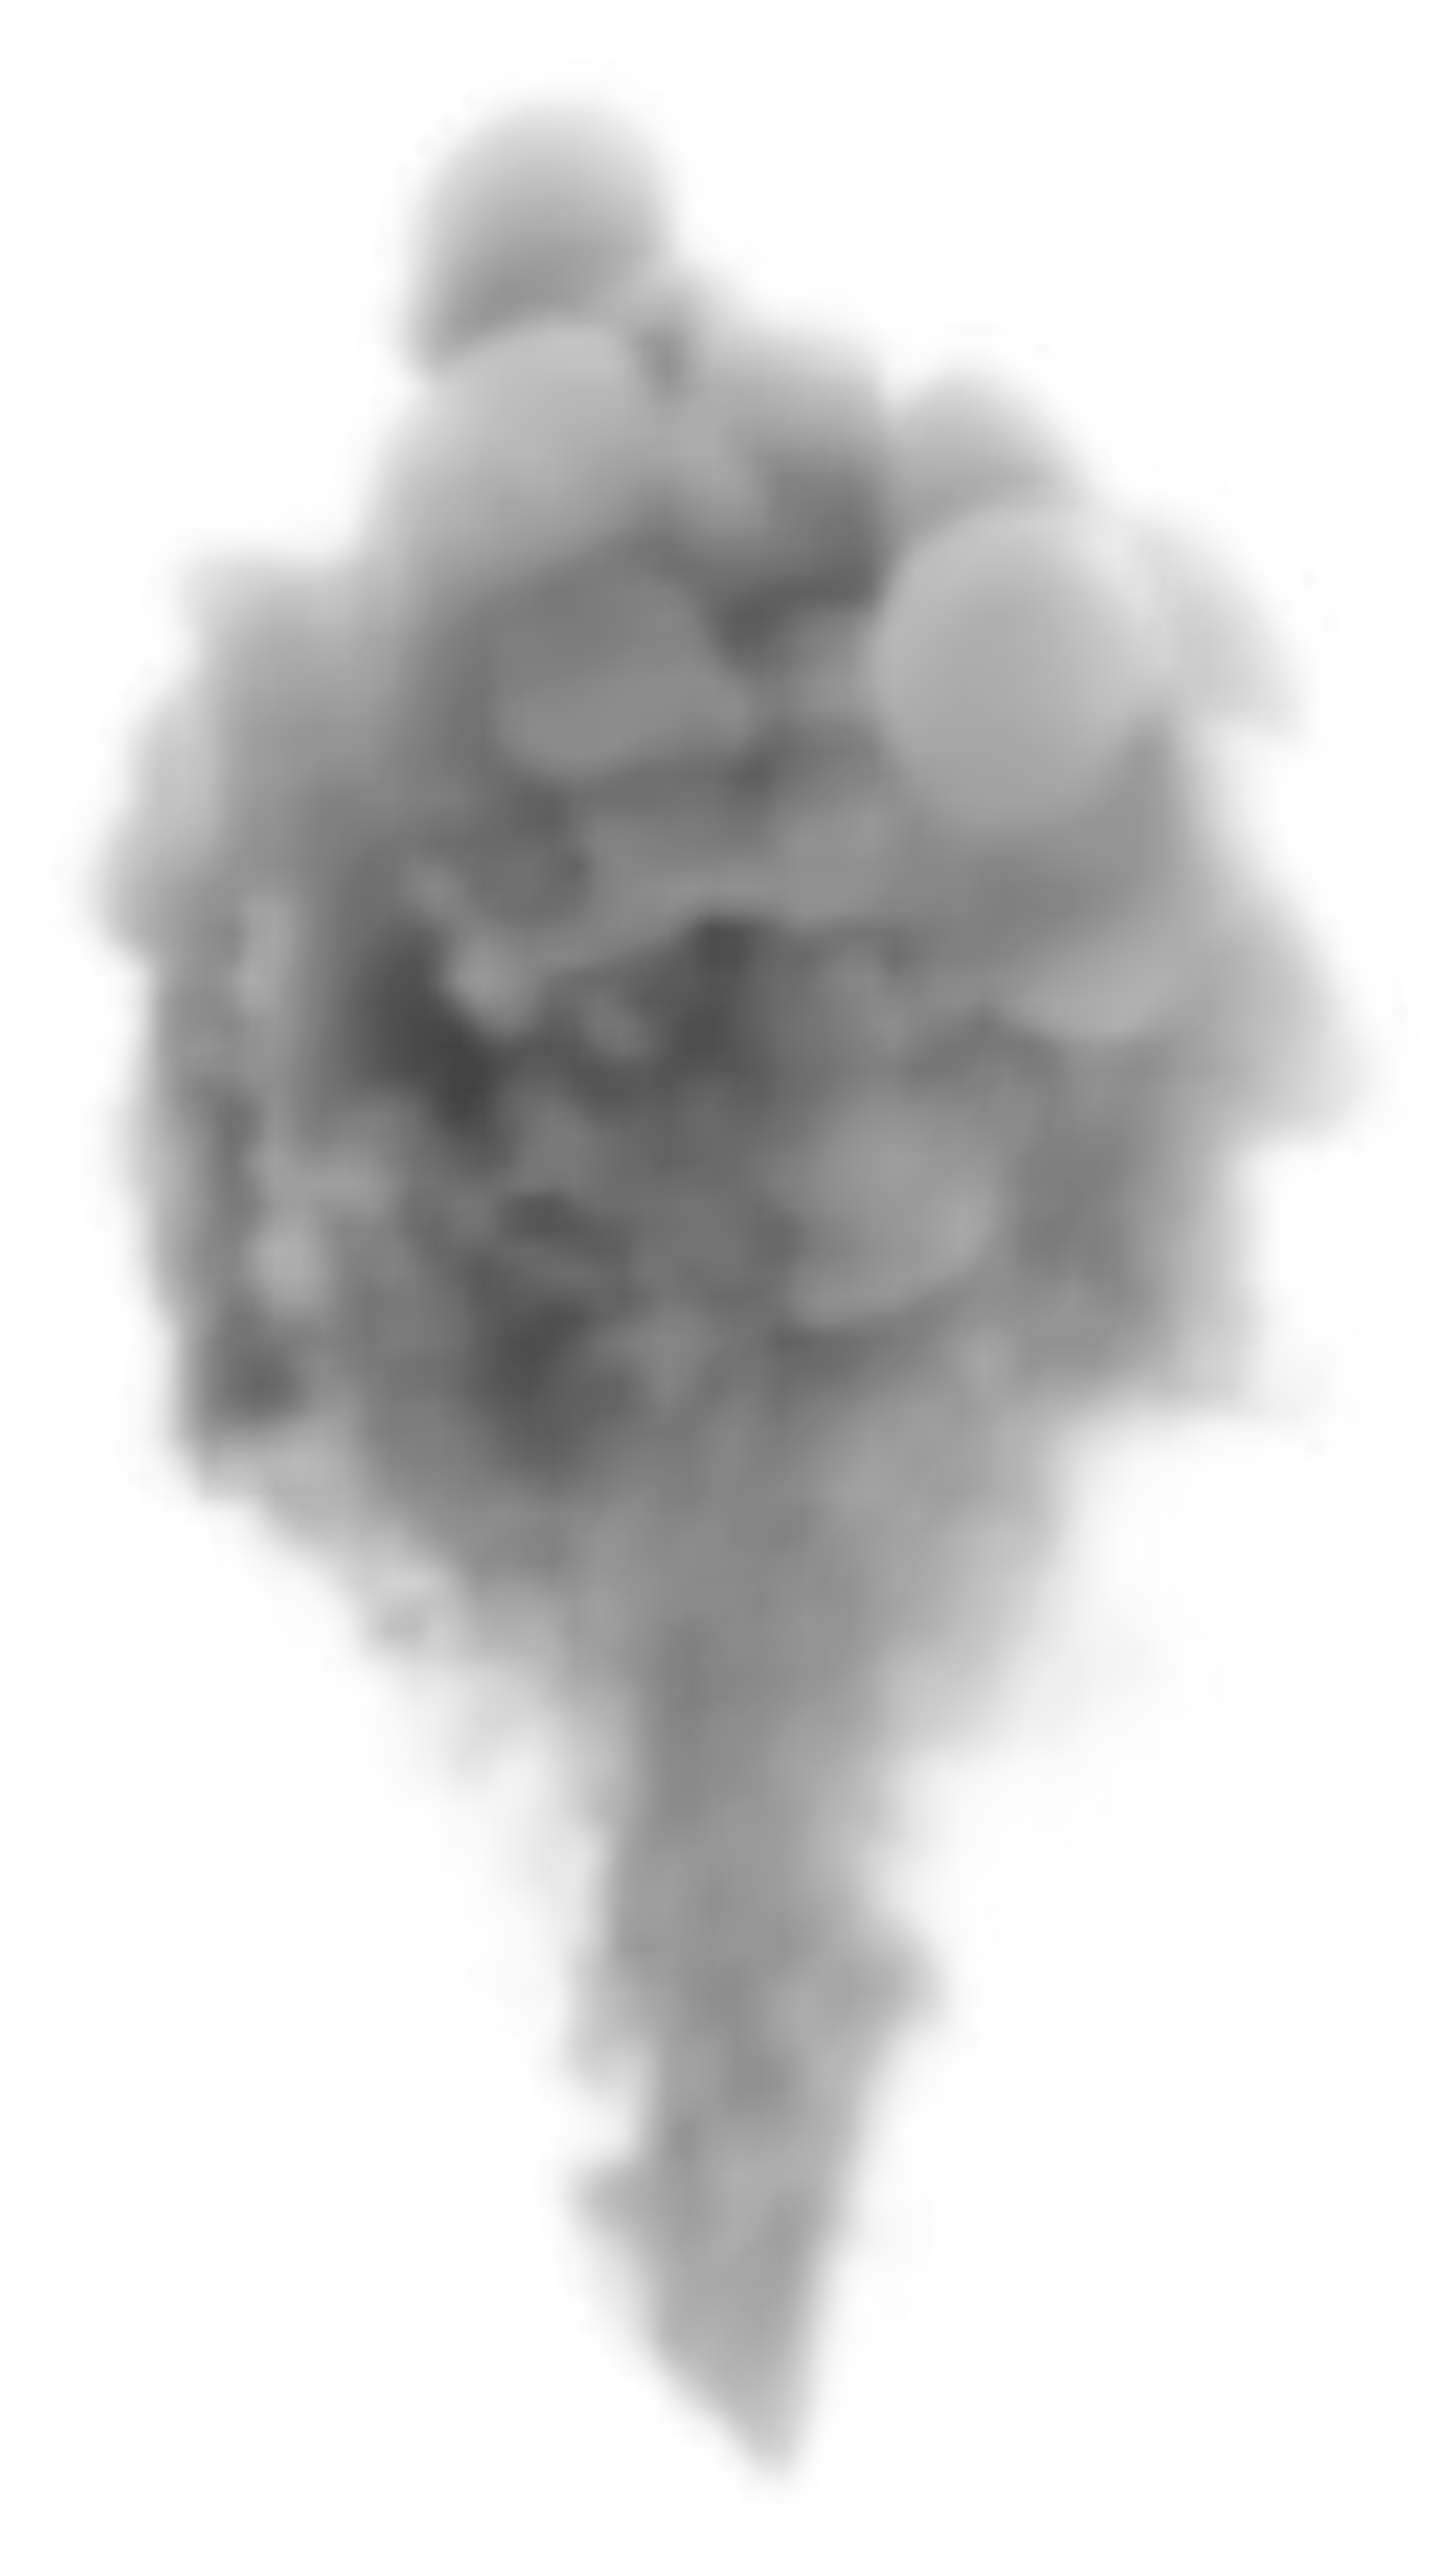 Large Smoke PNG Clipart Image.